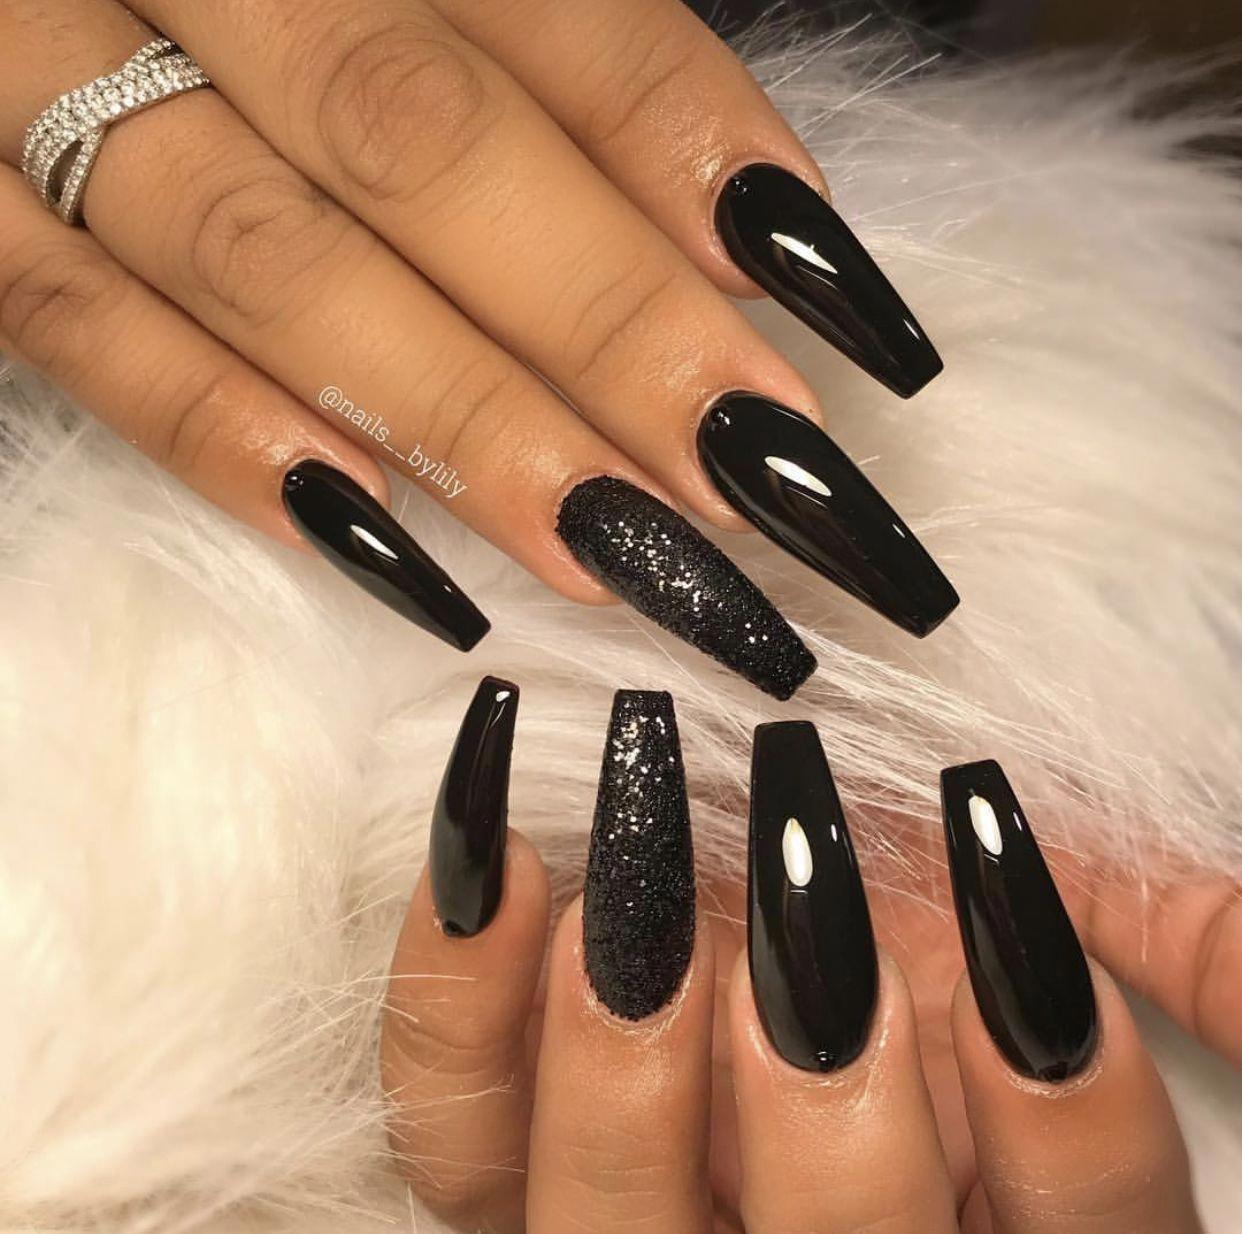 Check Out Simonelovee Typesofnaildesigns Cute Acrylic Nail Designs Acrylic Nail Designs Black Acrylic Nails